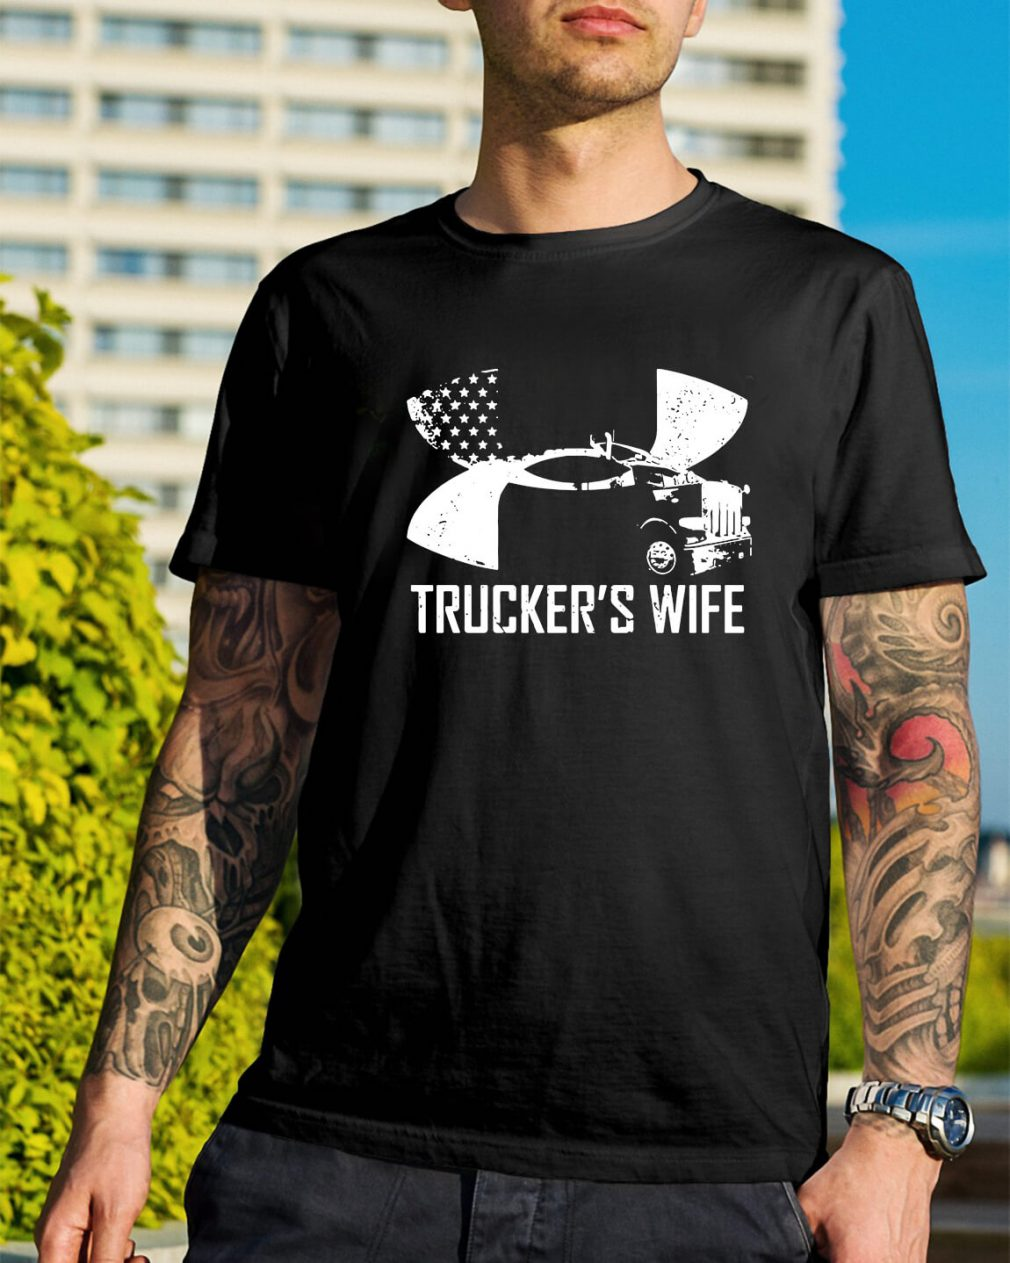 Under Armour trucker's wife shirt